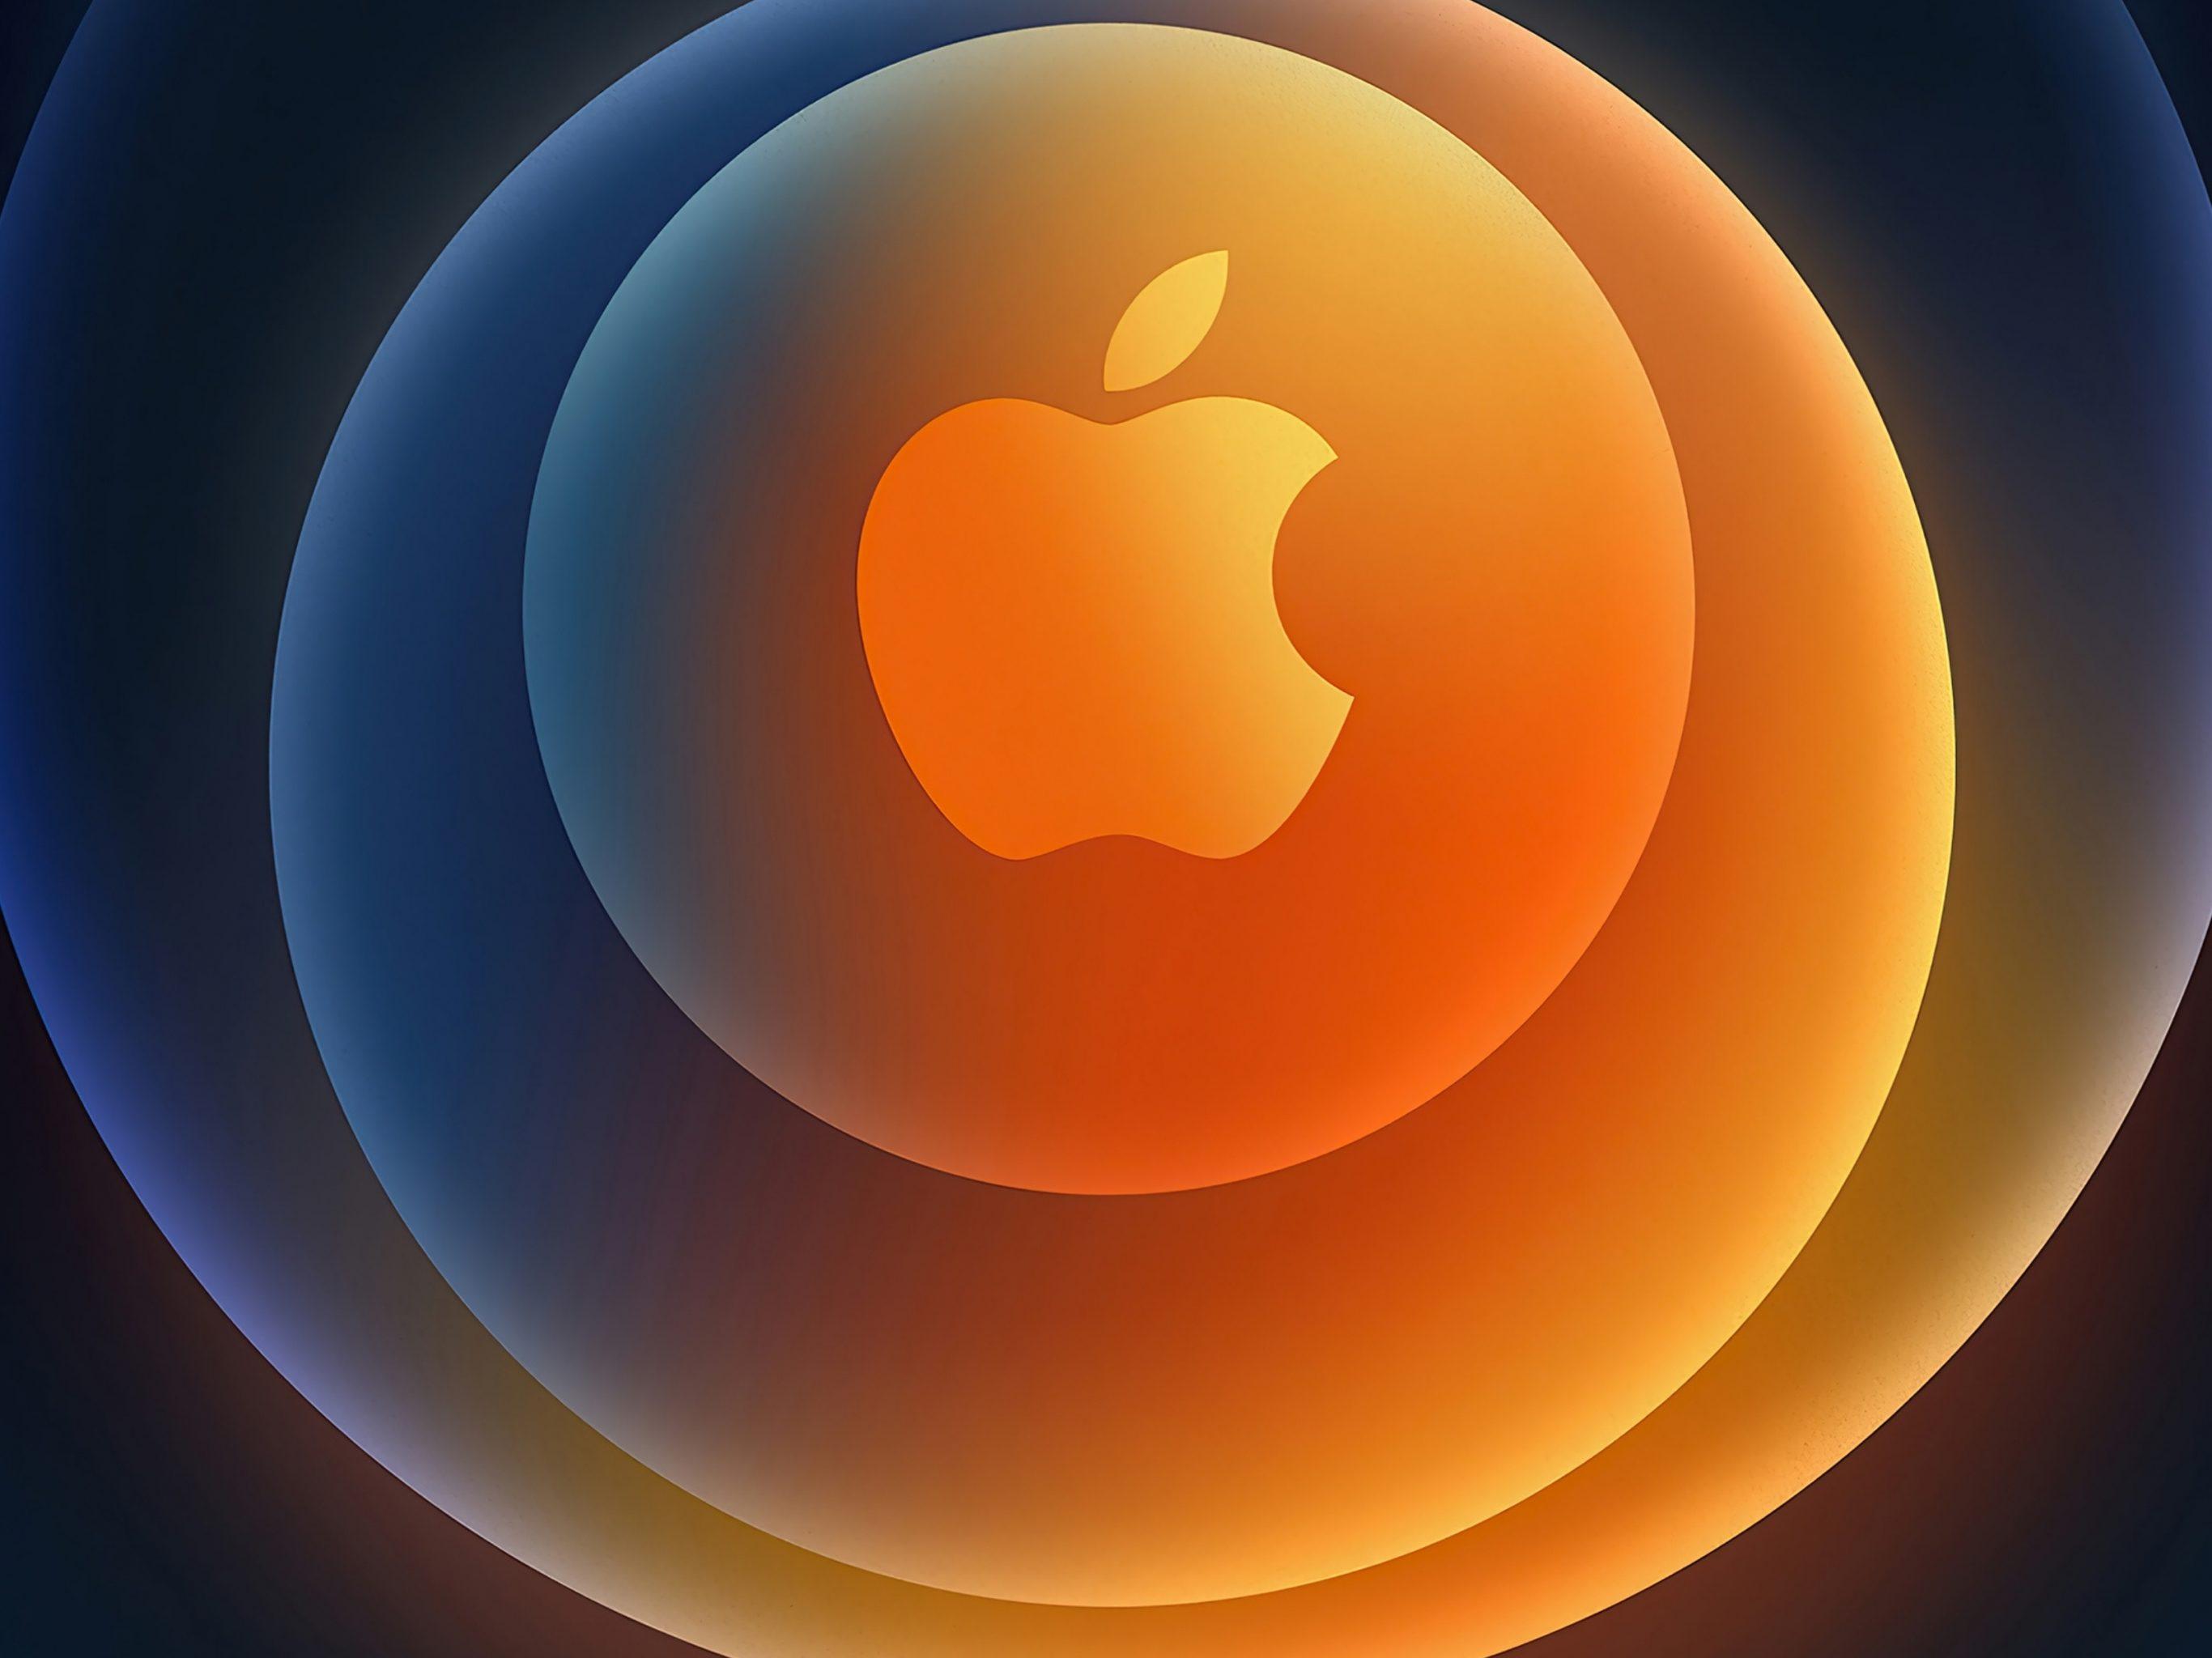 2732x2048 iPad air iPad Pro wallpapers iPhone 12 Apple Logo Circles iPad Wallpaper 2732x2048 pixels resolution